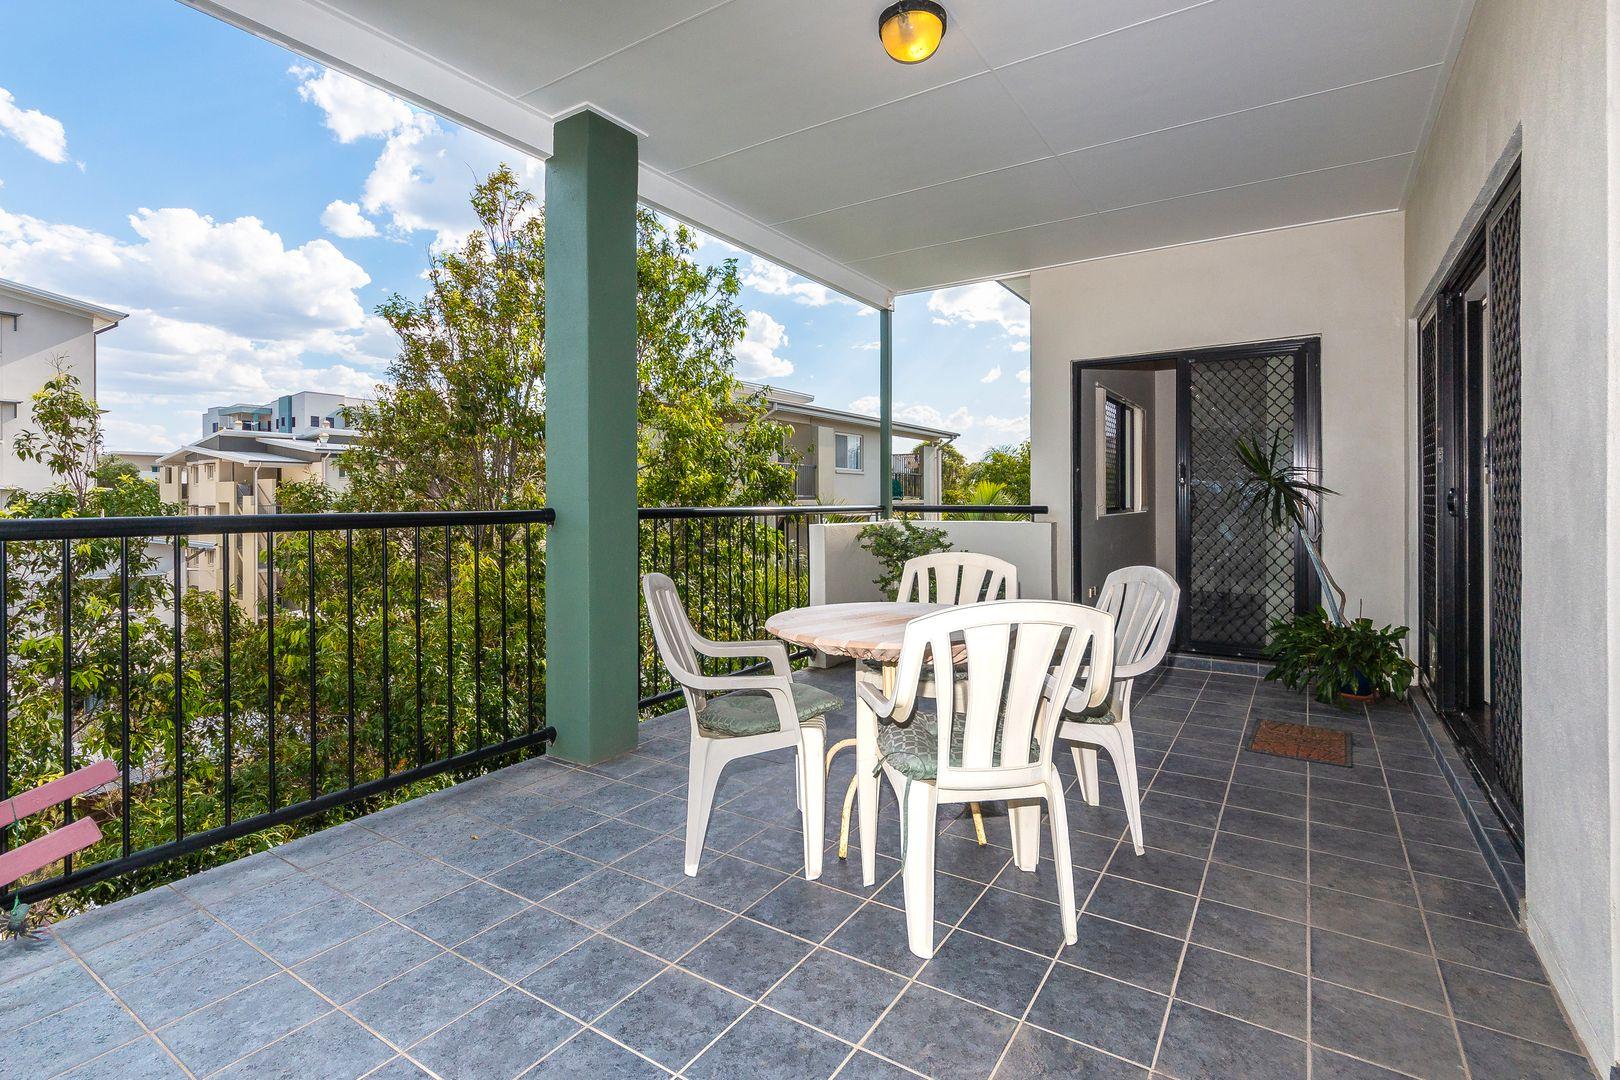 8/11 McNaughton Street, Redcliffe QLD 4020, Image 0